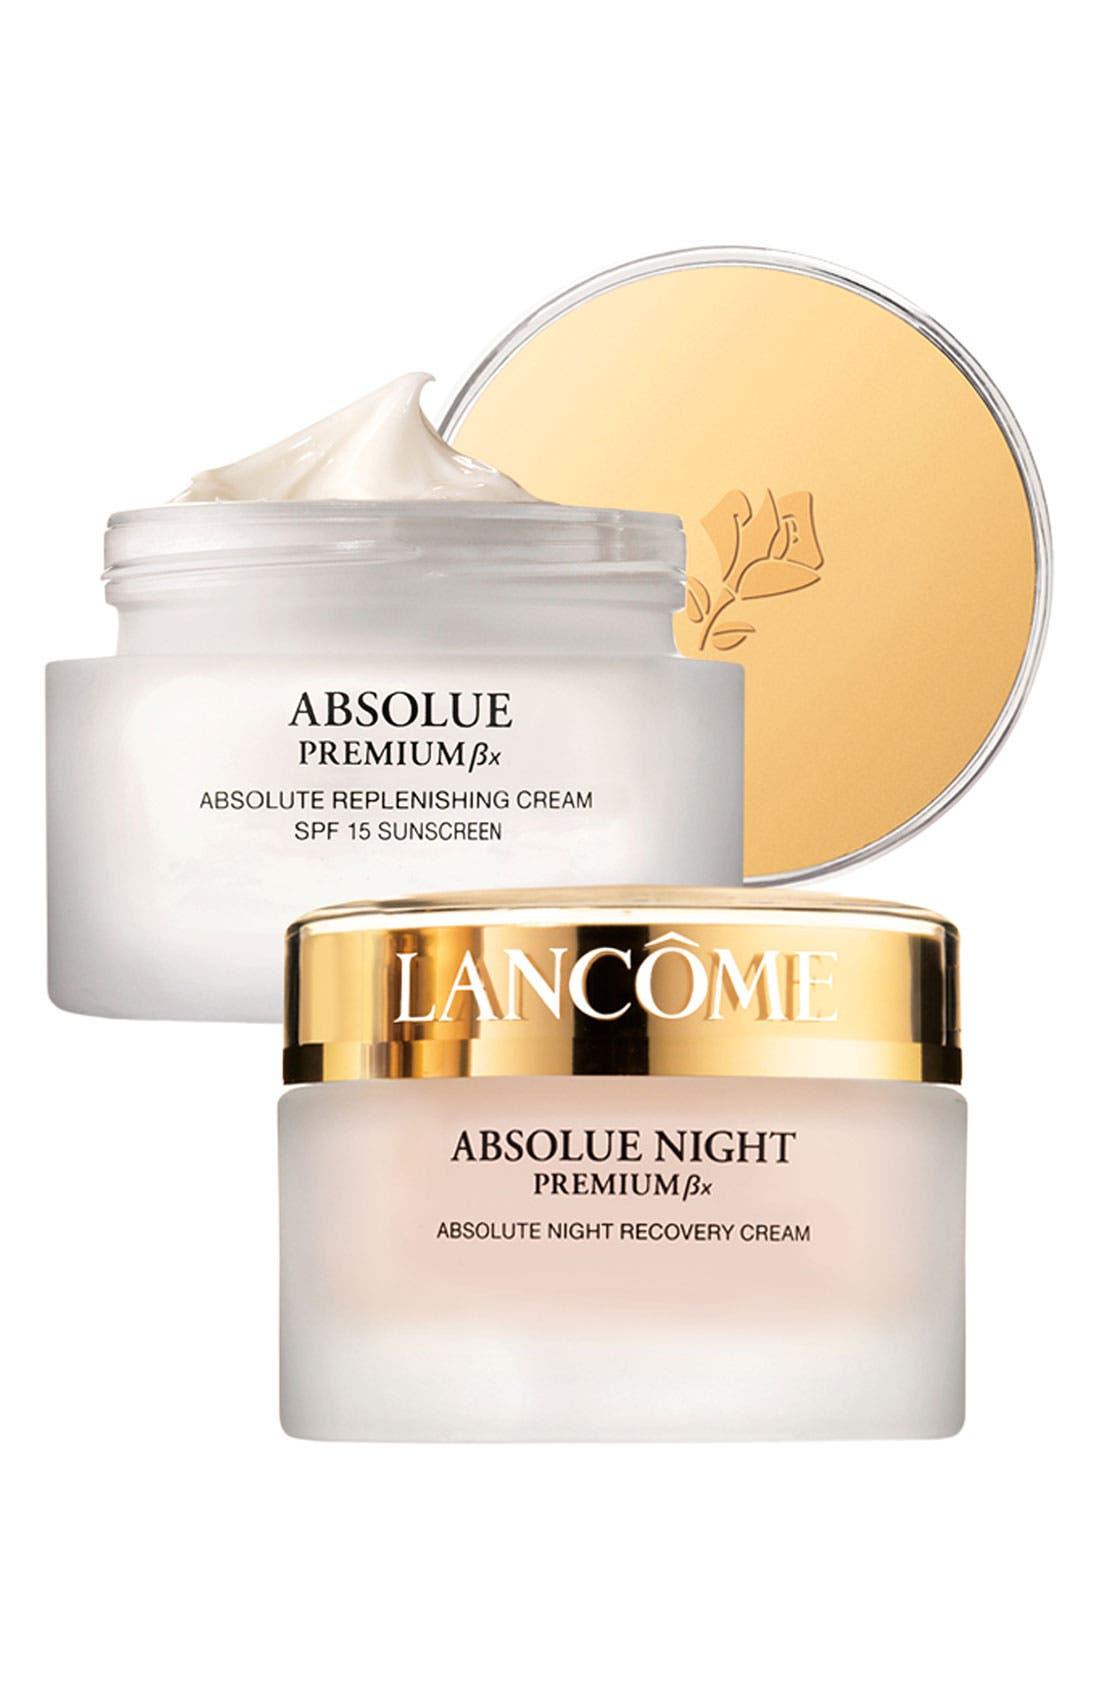 Alternate Image 1 Selected - Lancôme 'Absolue Premium ßx' Cream Duo ($330 Value)